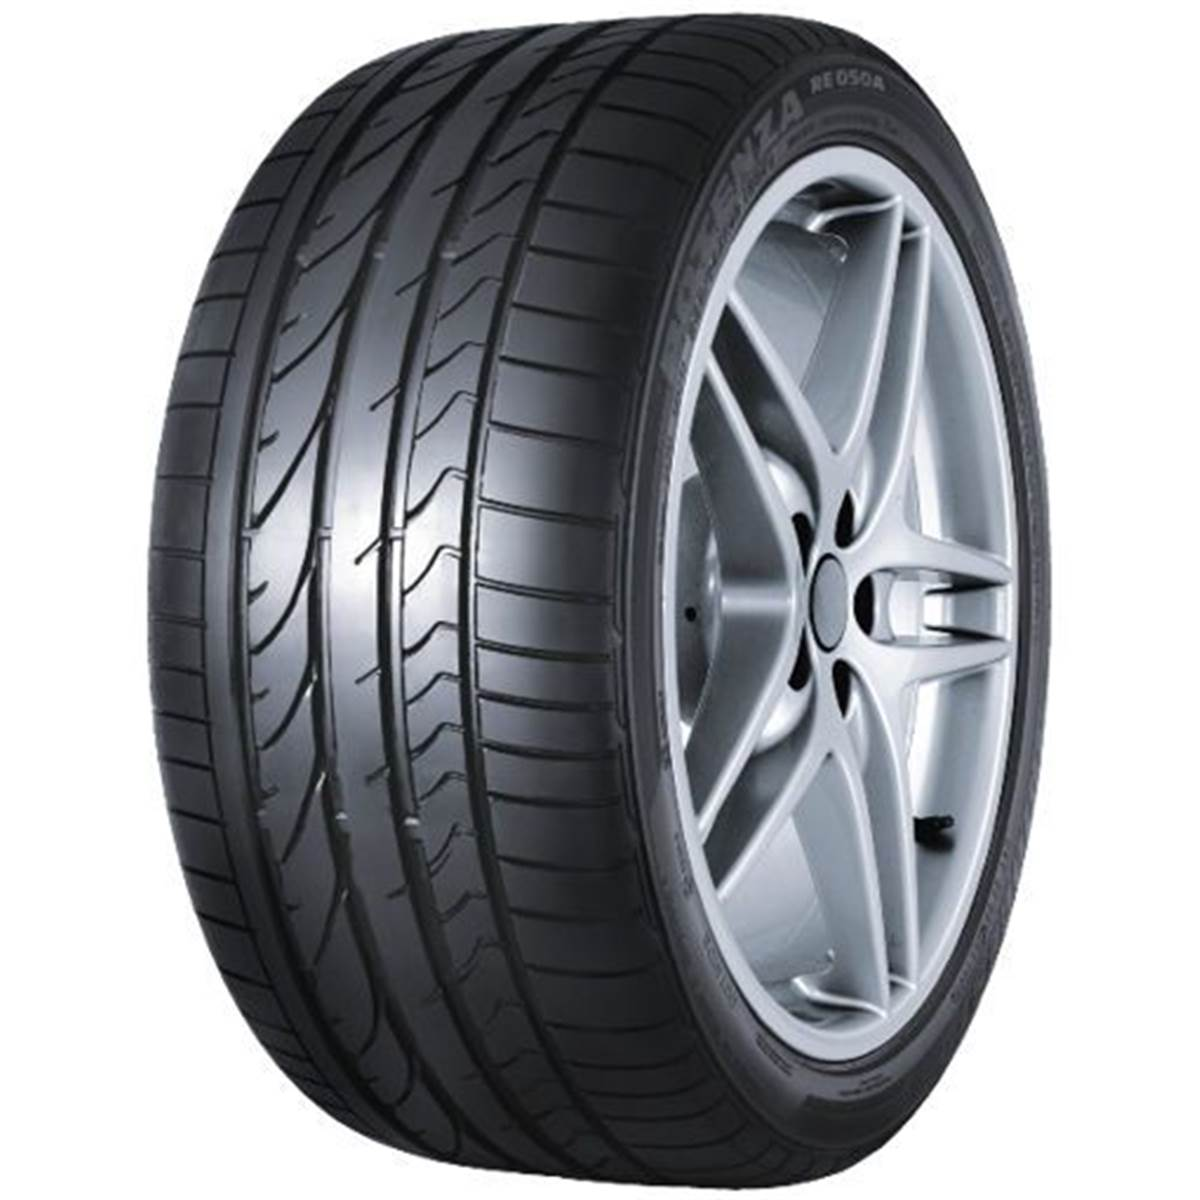 Bridgestone Potenza Re050a Homologue Bmw Xl